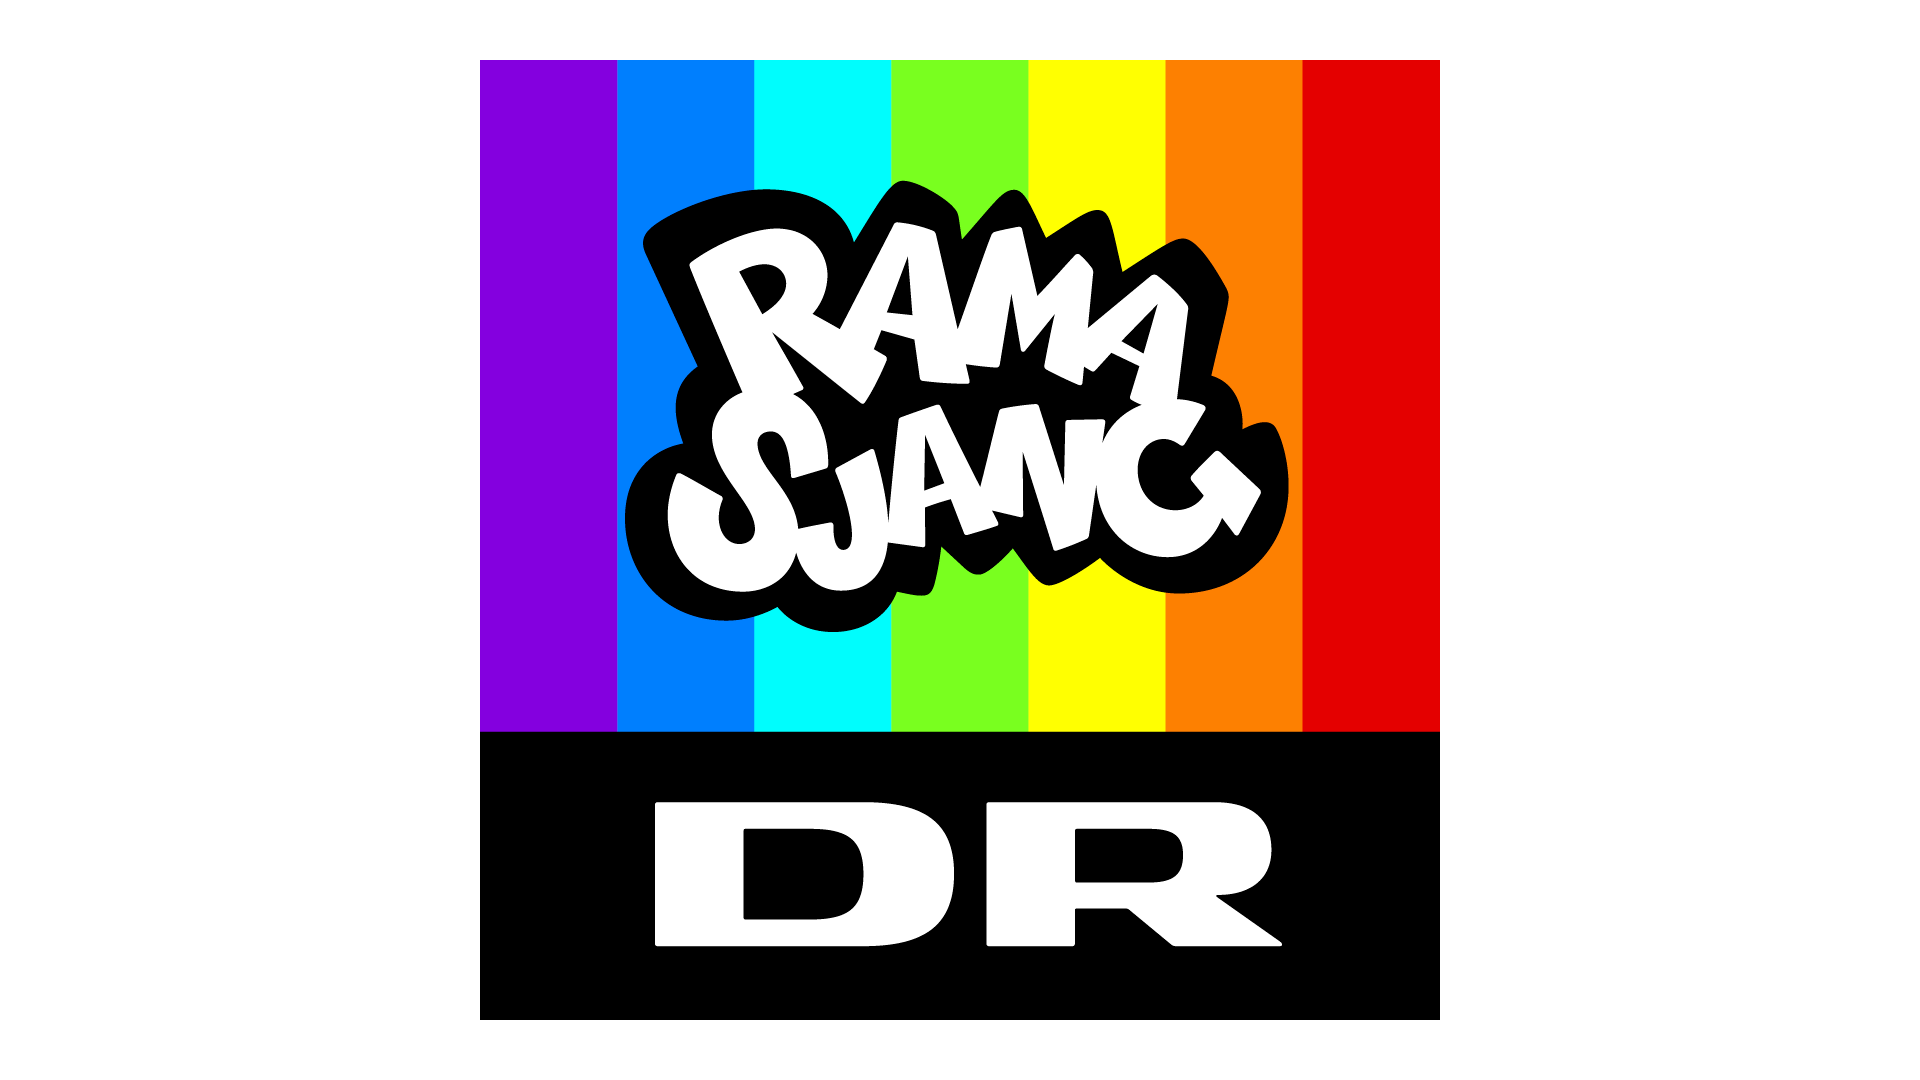 DR Ramasjang Live TV, Online